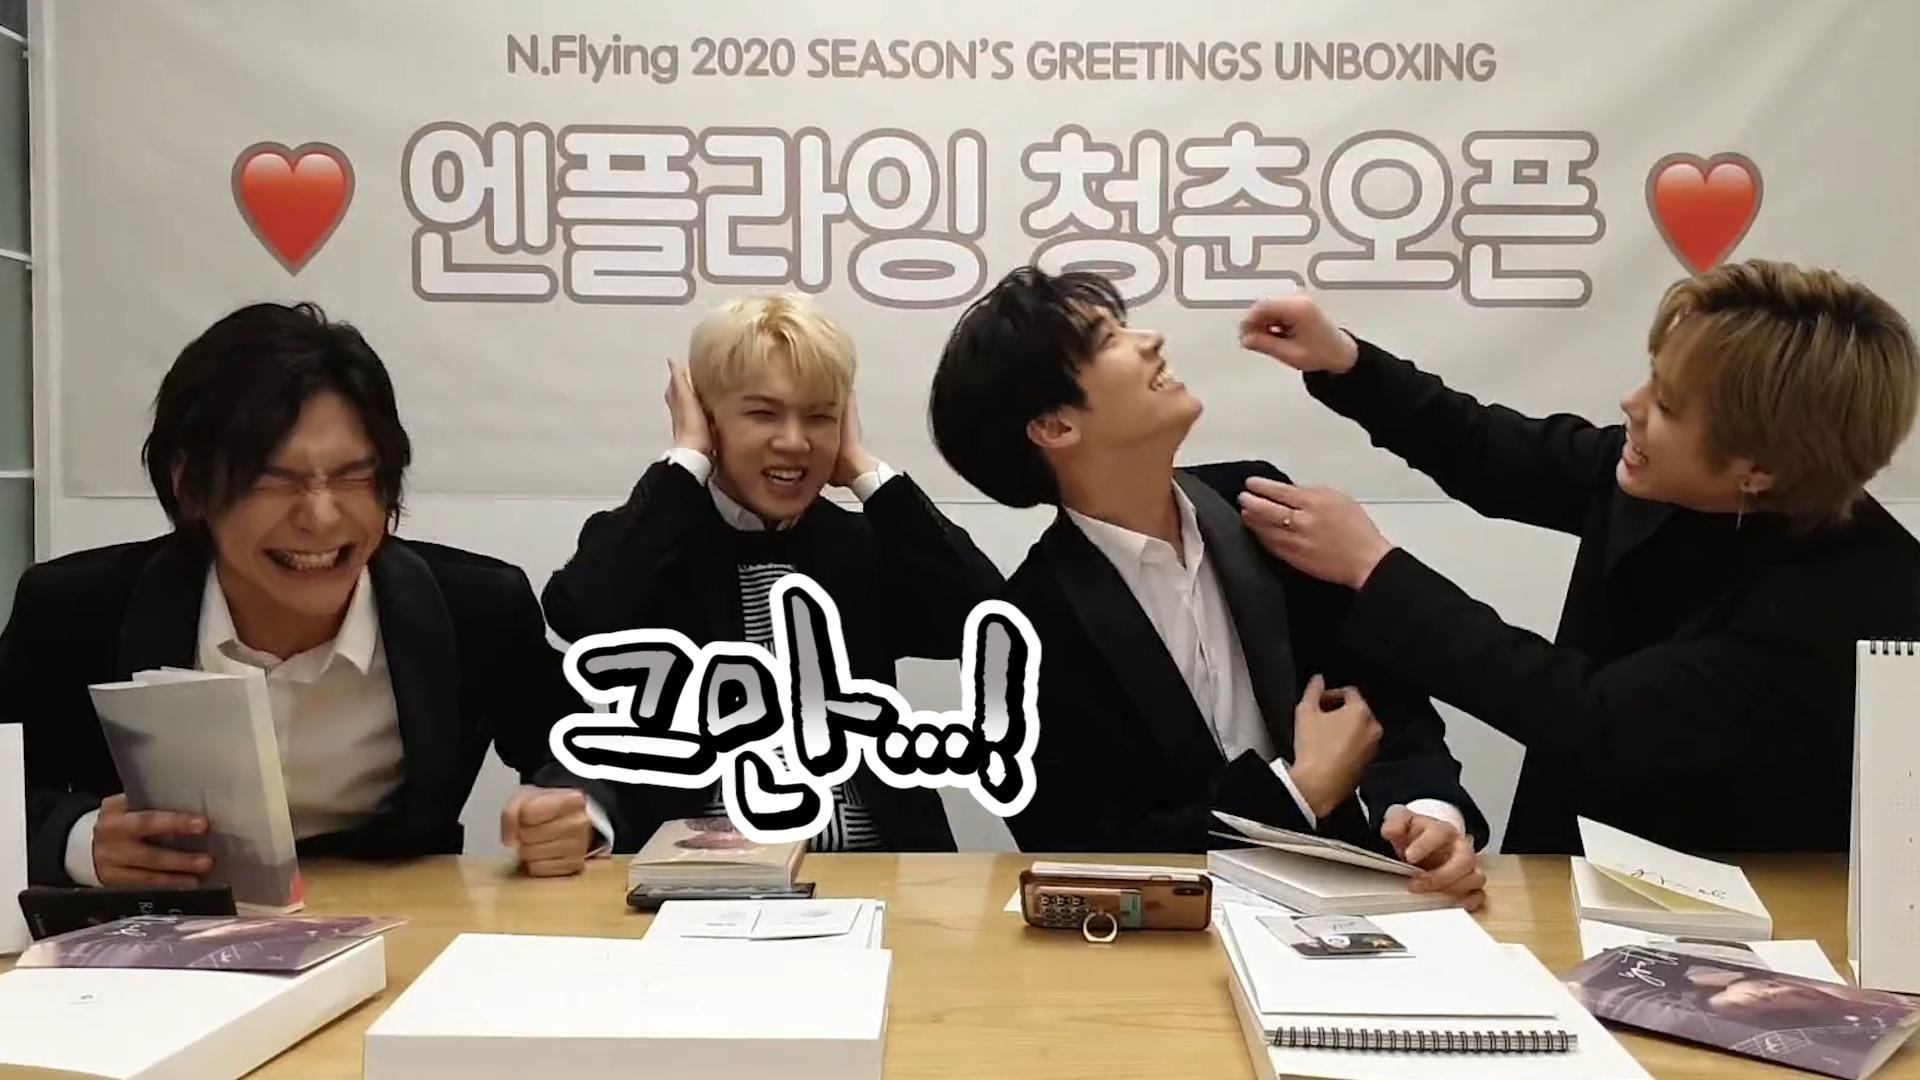 [N.Flying] 😬시그 언박싱하다 스케일링을 받는 아이돌 밴드가 있다!?😬 (N.Flying's season's greeting unboxing)